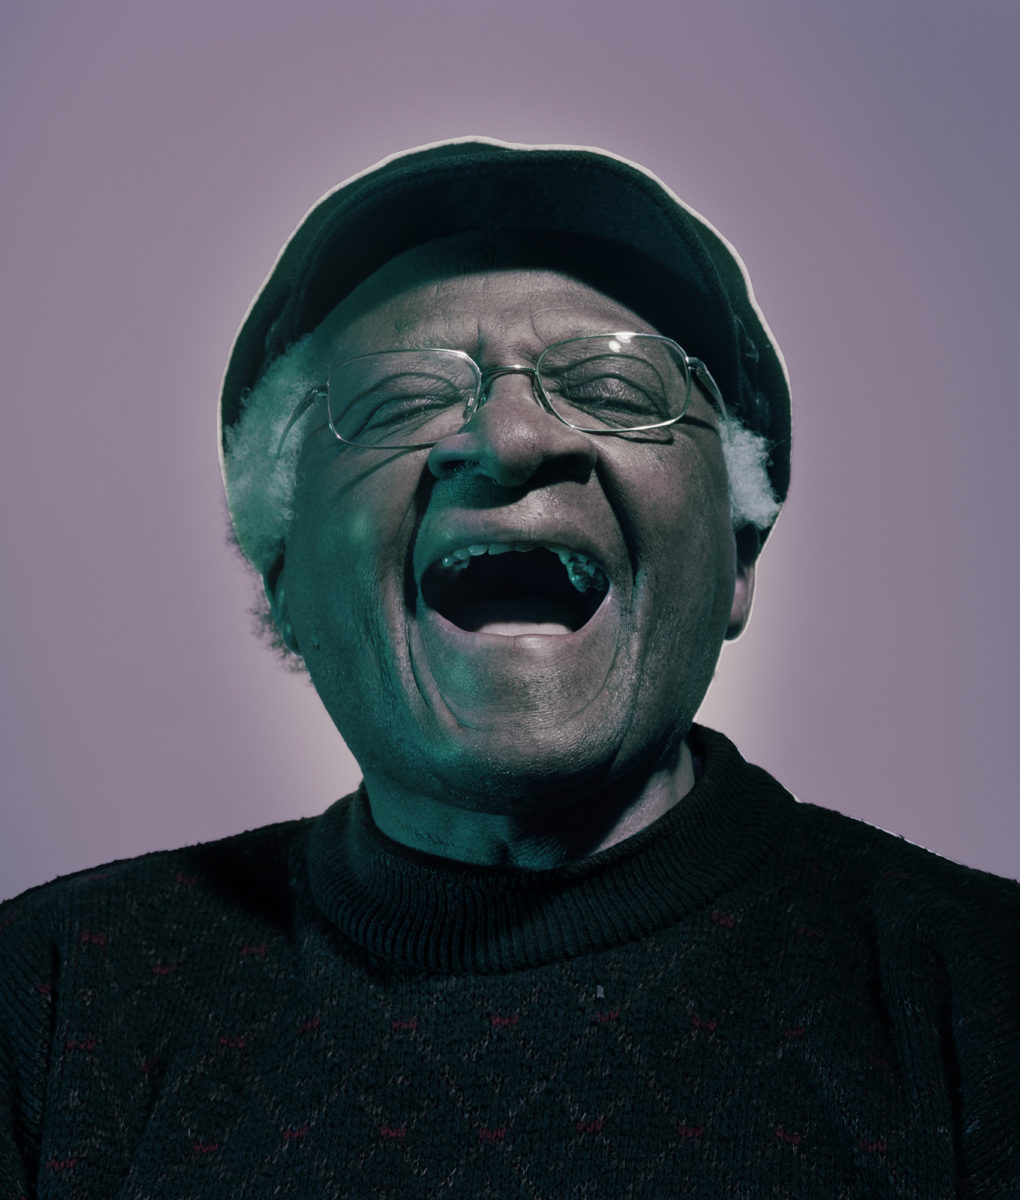 Desmond Tutu, London, England, 2004